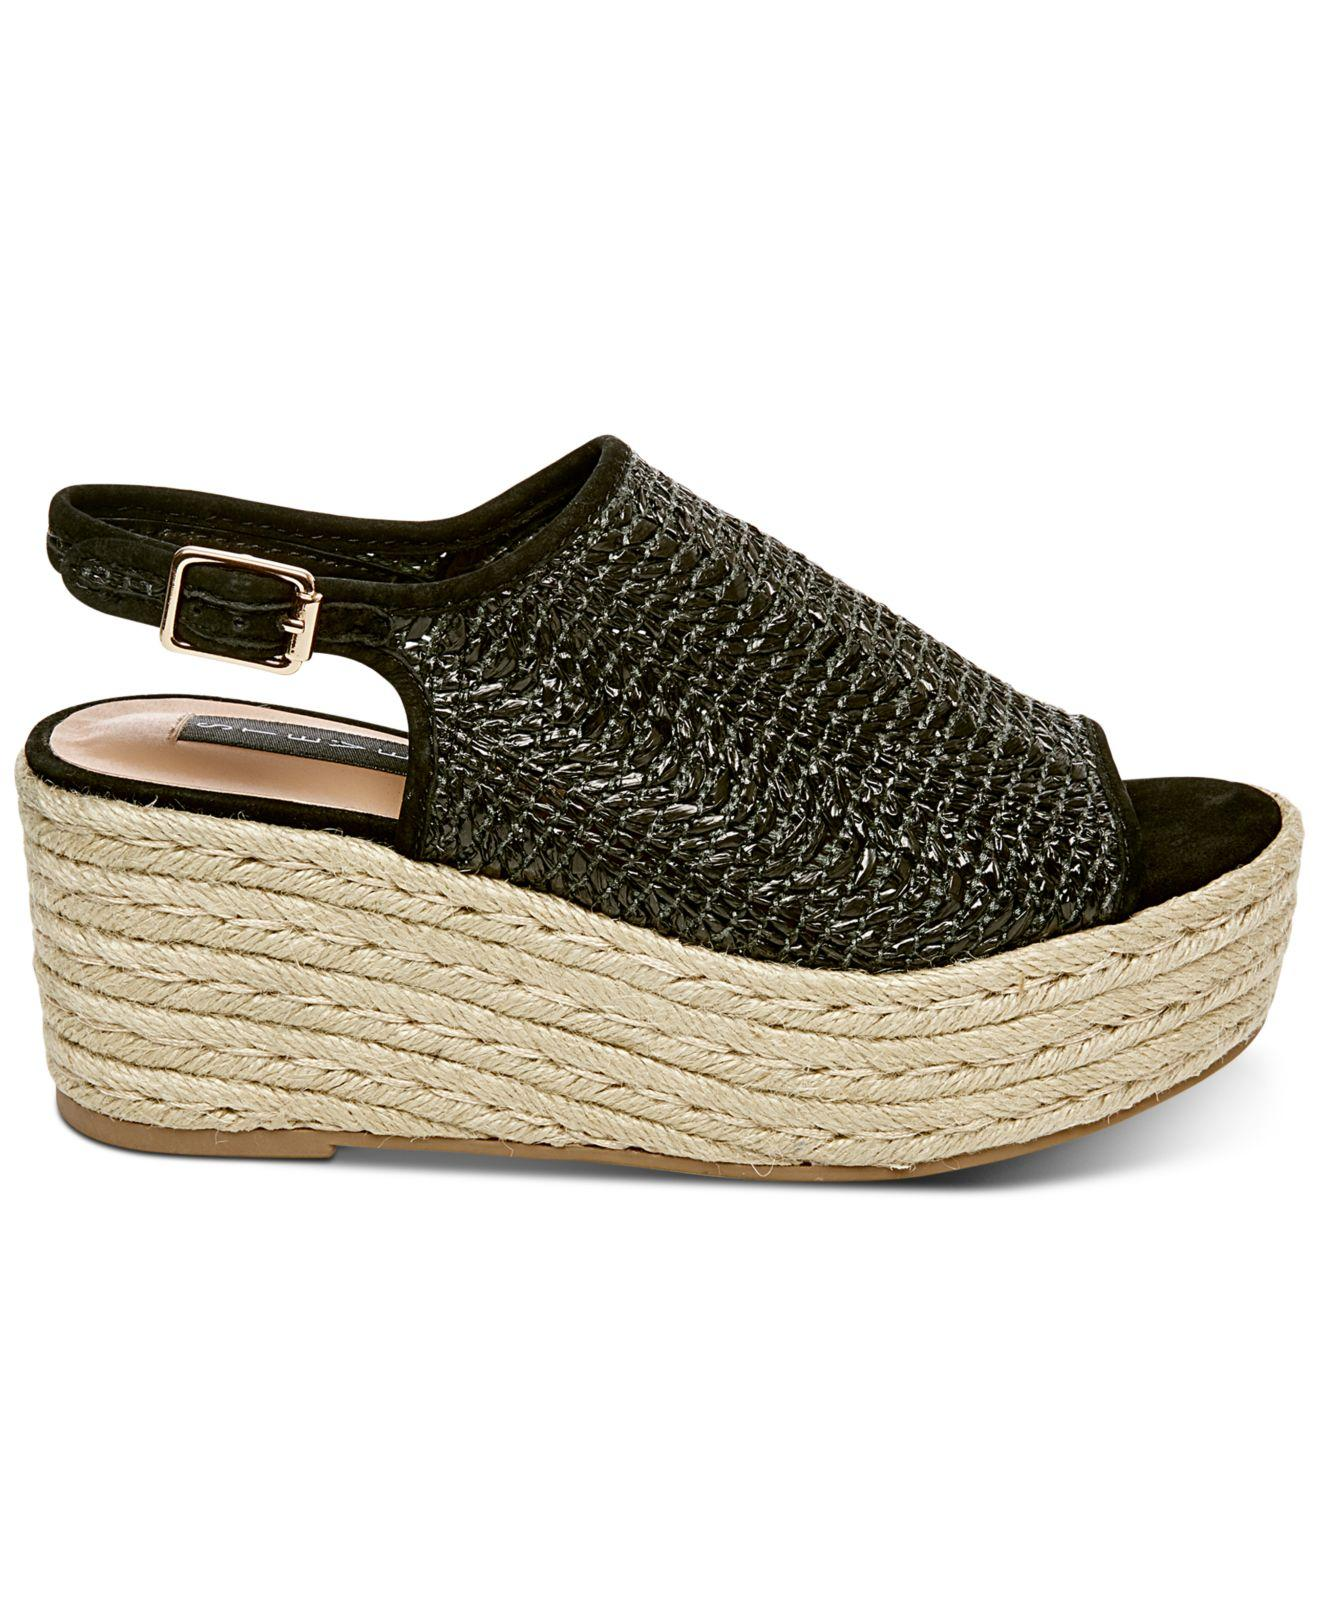 ec125cbd4b0 Lyst - Steven by Steve Madden Courage Espadrille Wedge Sandals in Black -  Save 35%